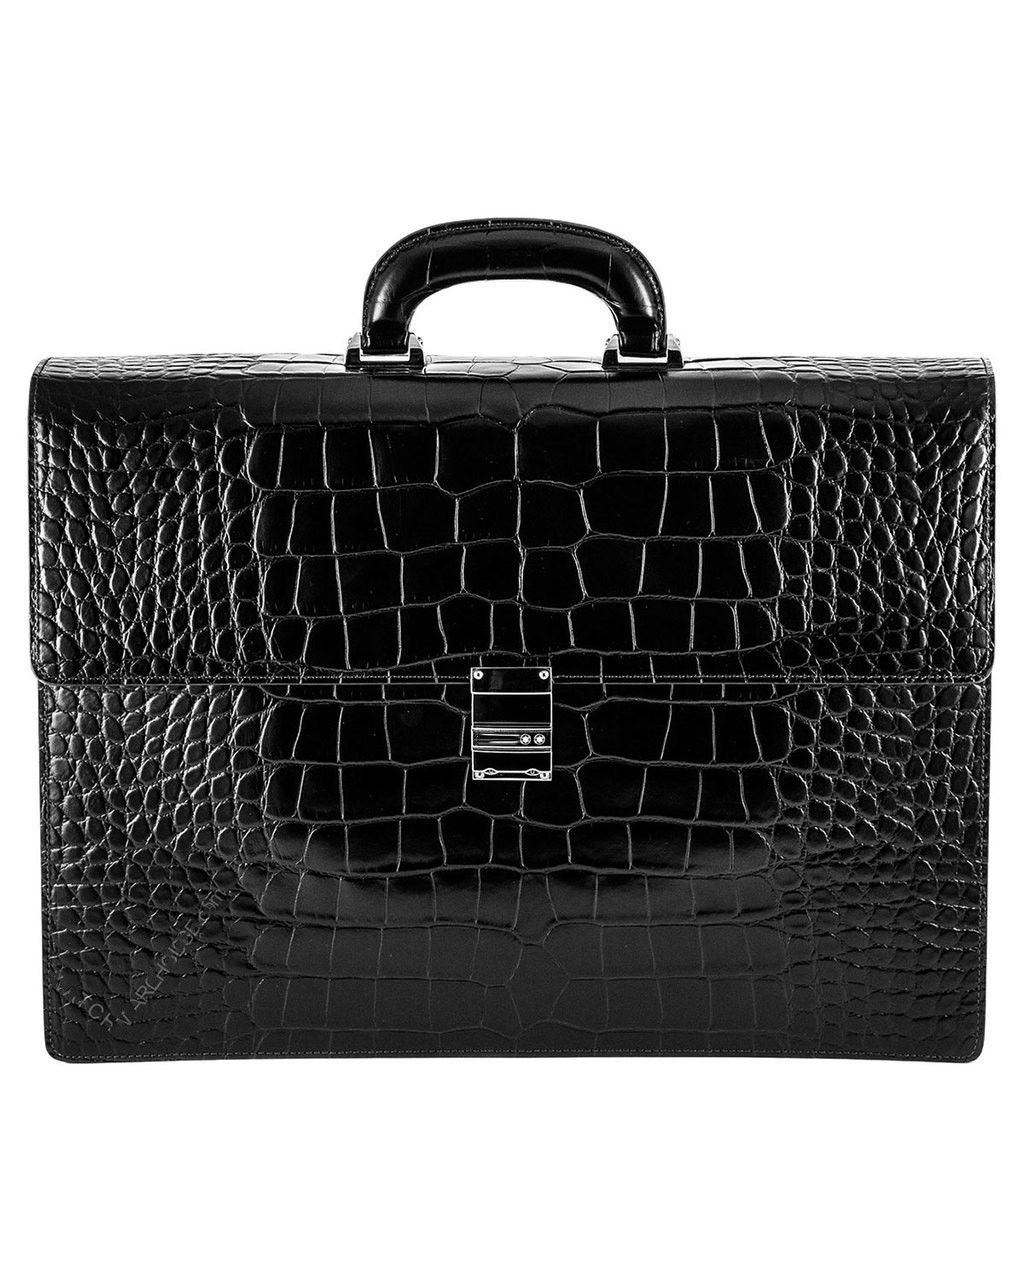 1259fac35 Alligator briefcase for sale Briefcases, Leather Briefcase, Crocodile, Leather  Portfolio